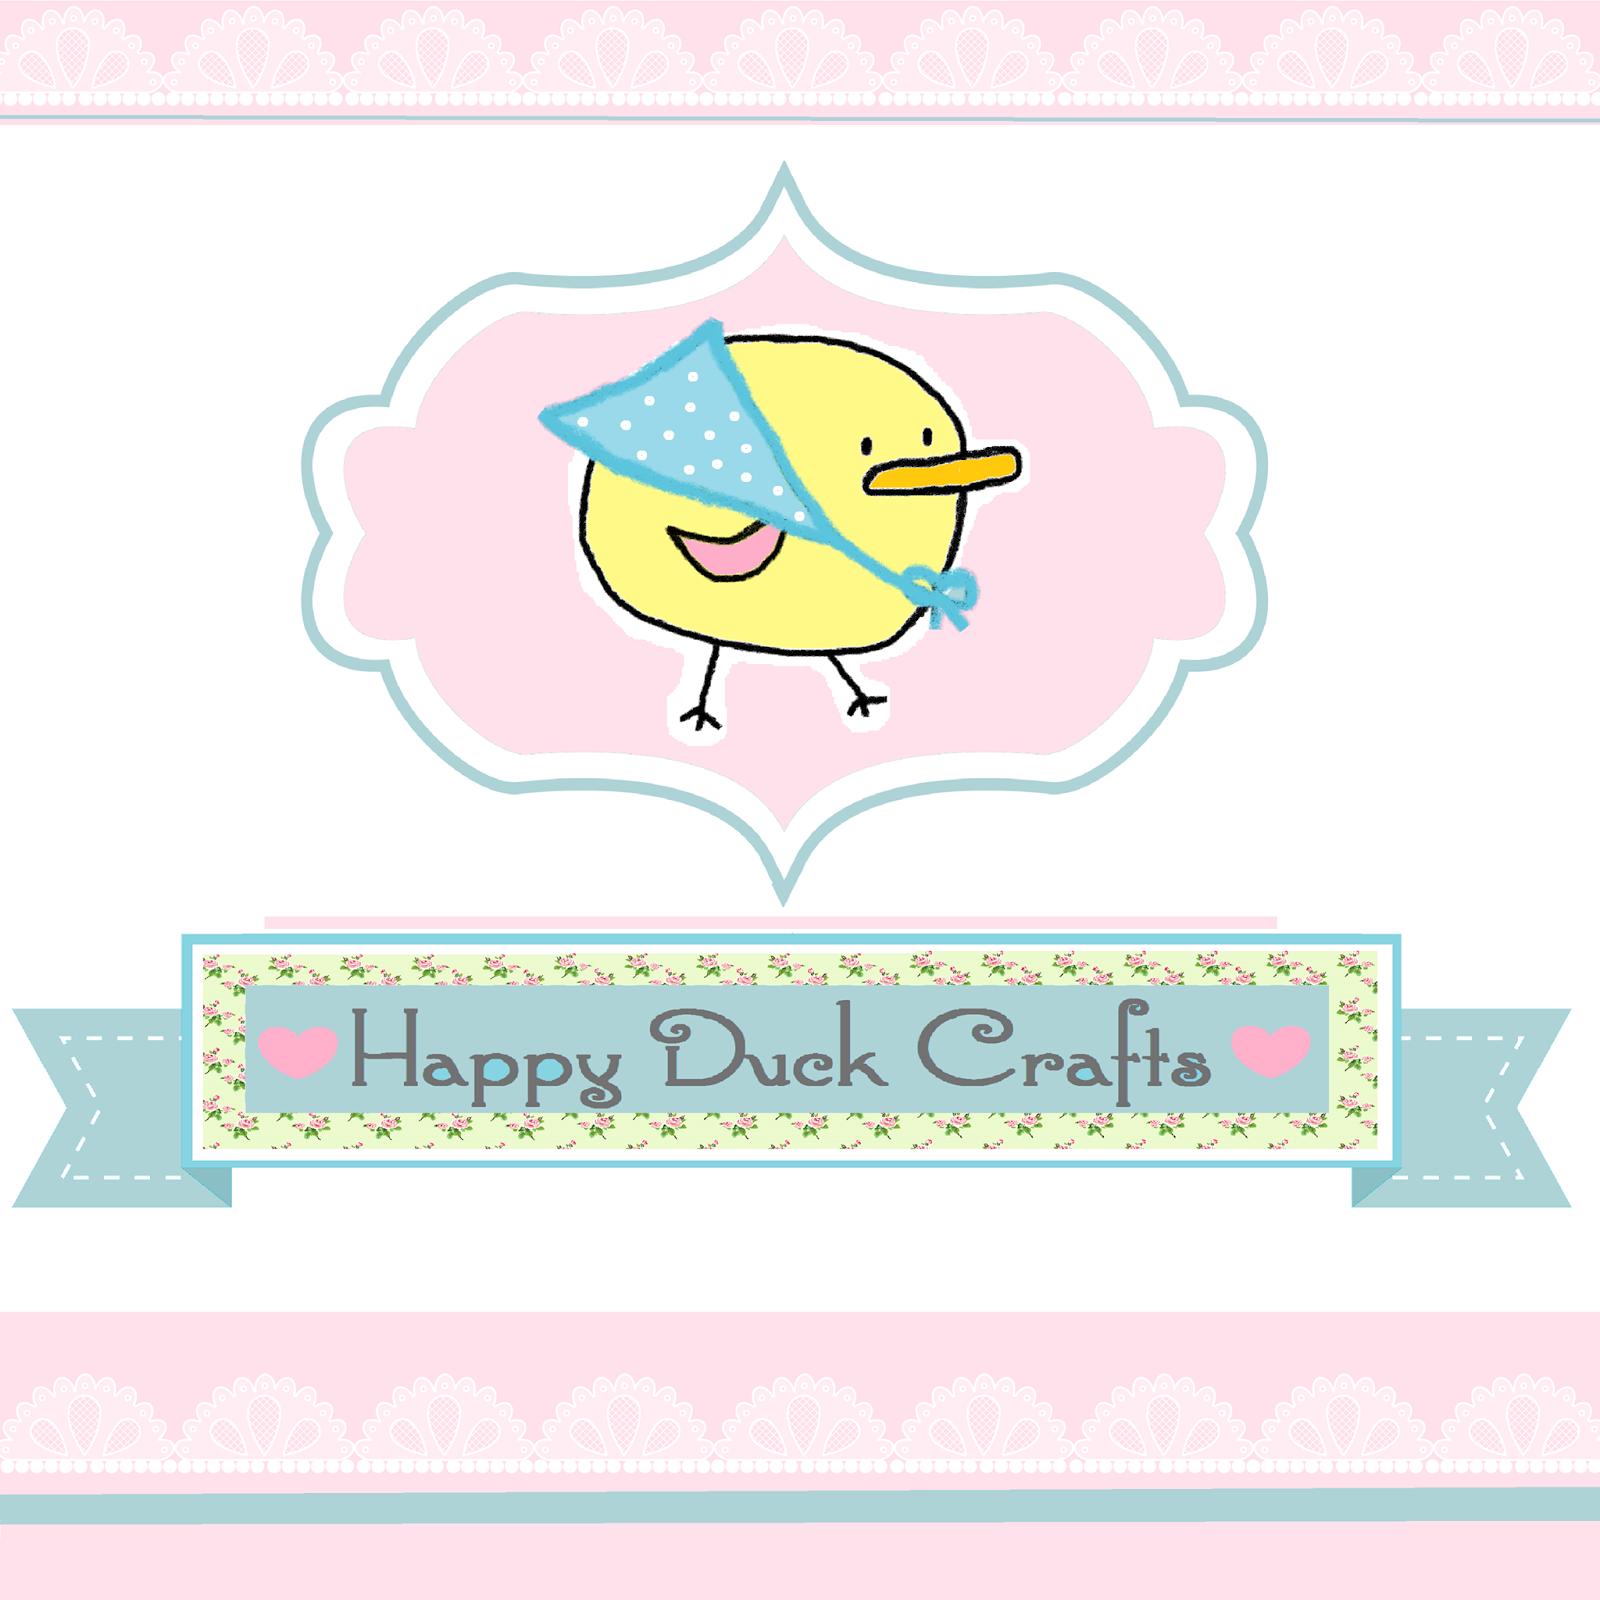 Happy Duck Crafts